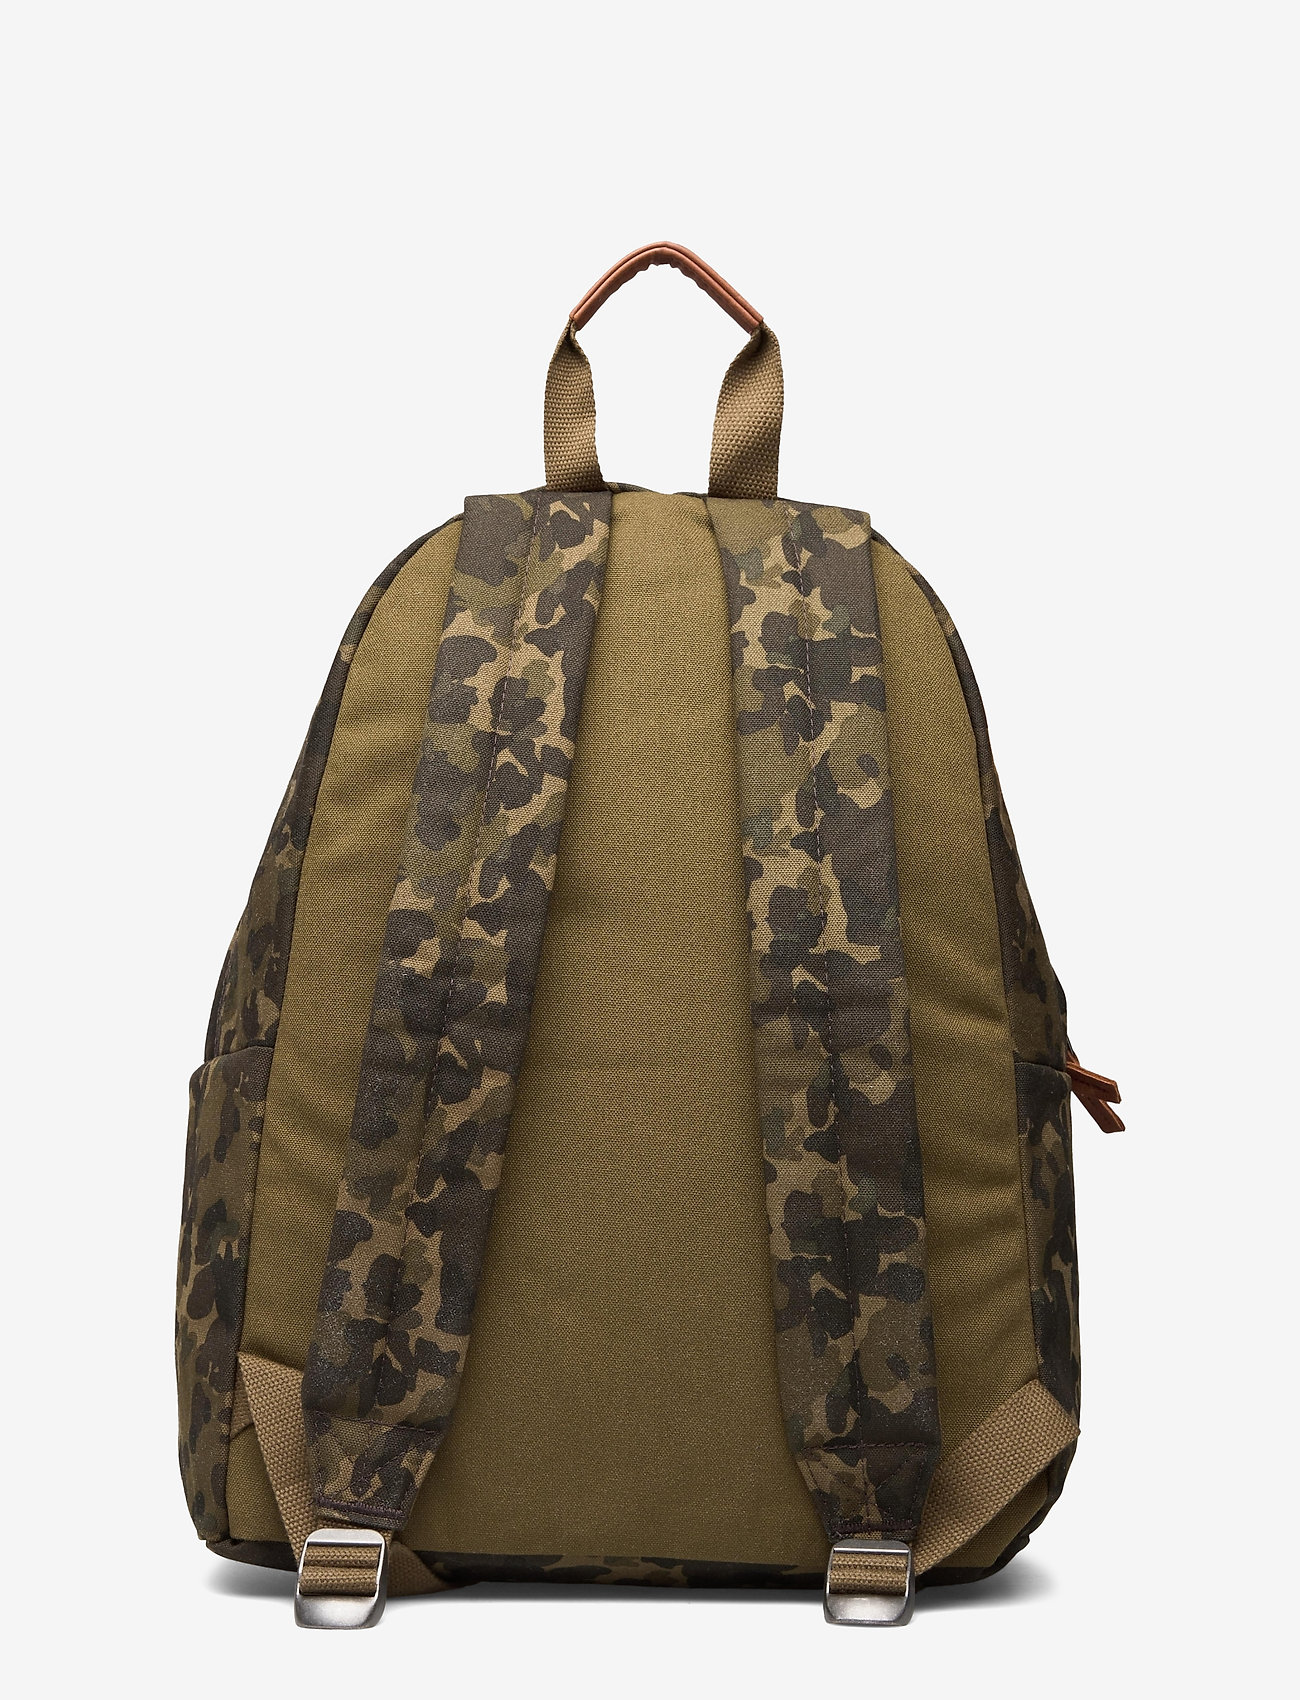 Eastpak - PADDED PAK'R - rucksäcke - opgrade camo - 1